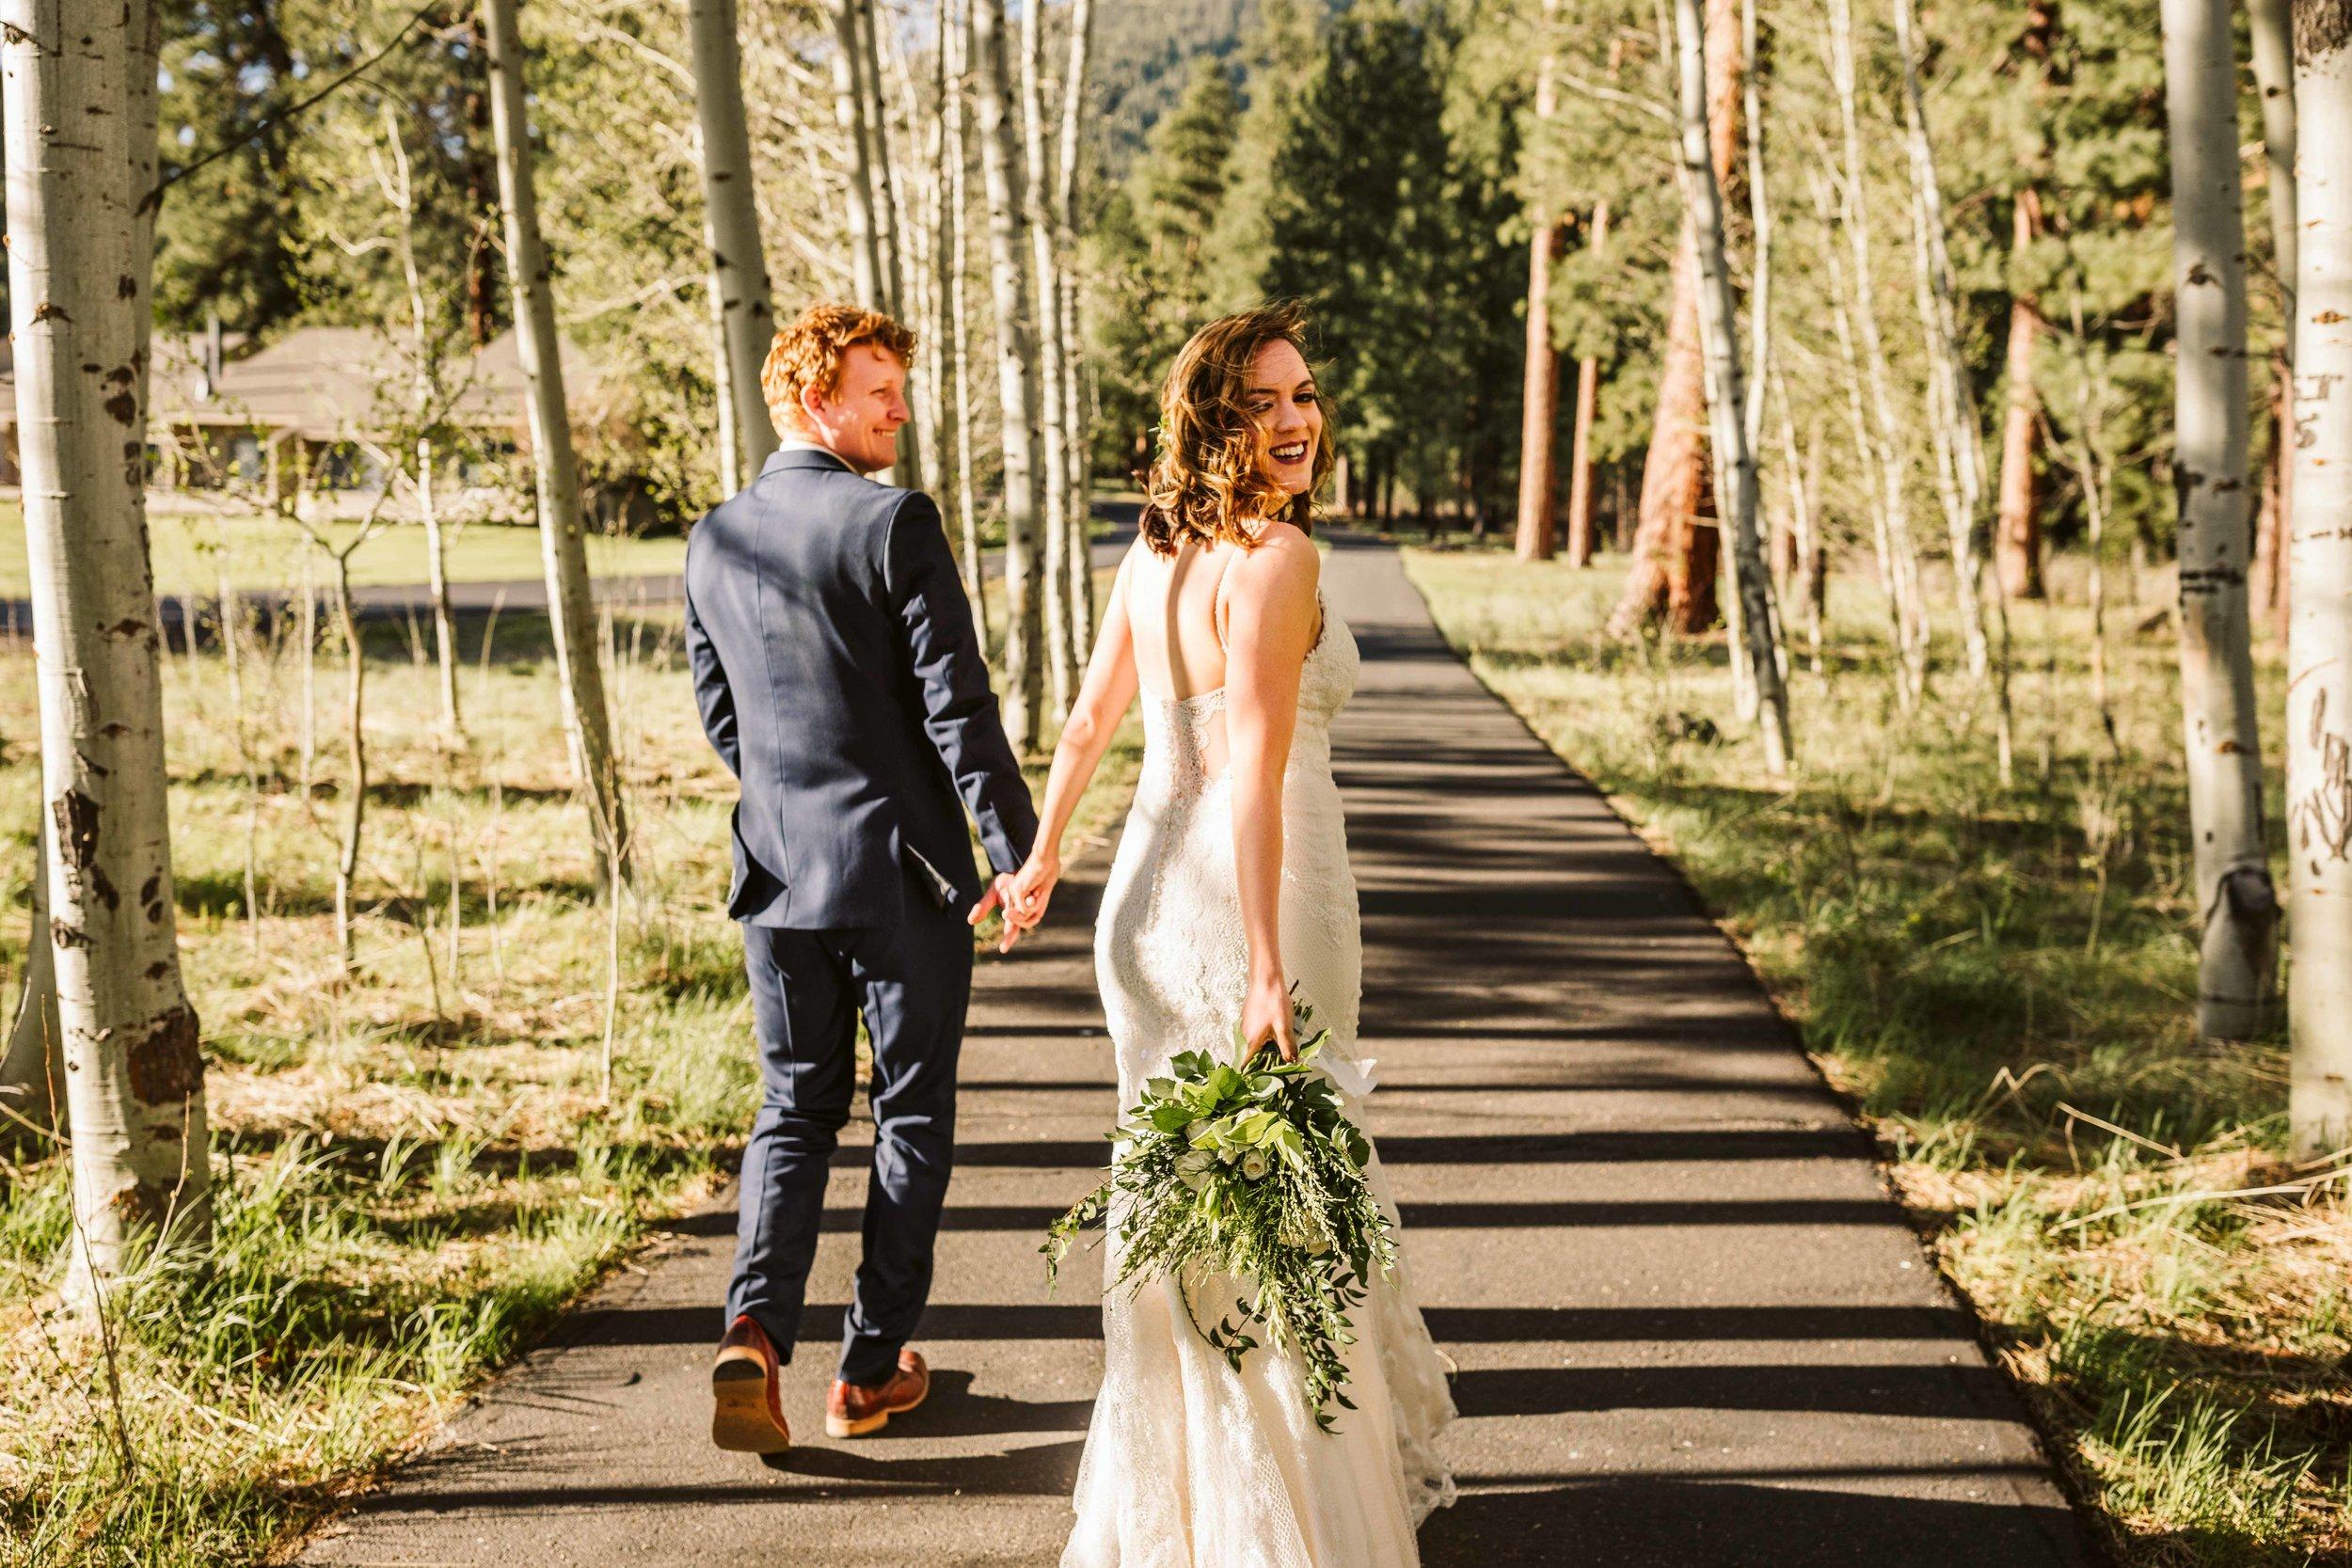 bend-oregon-wedding-photographer-78.jpg